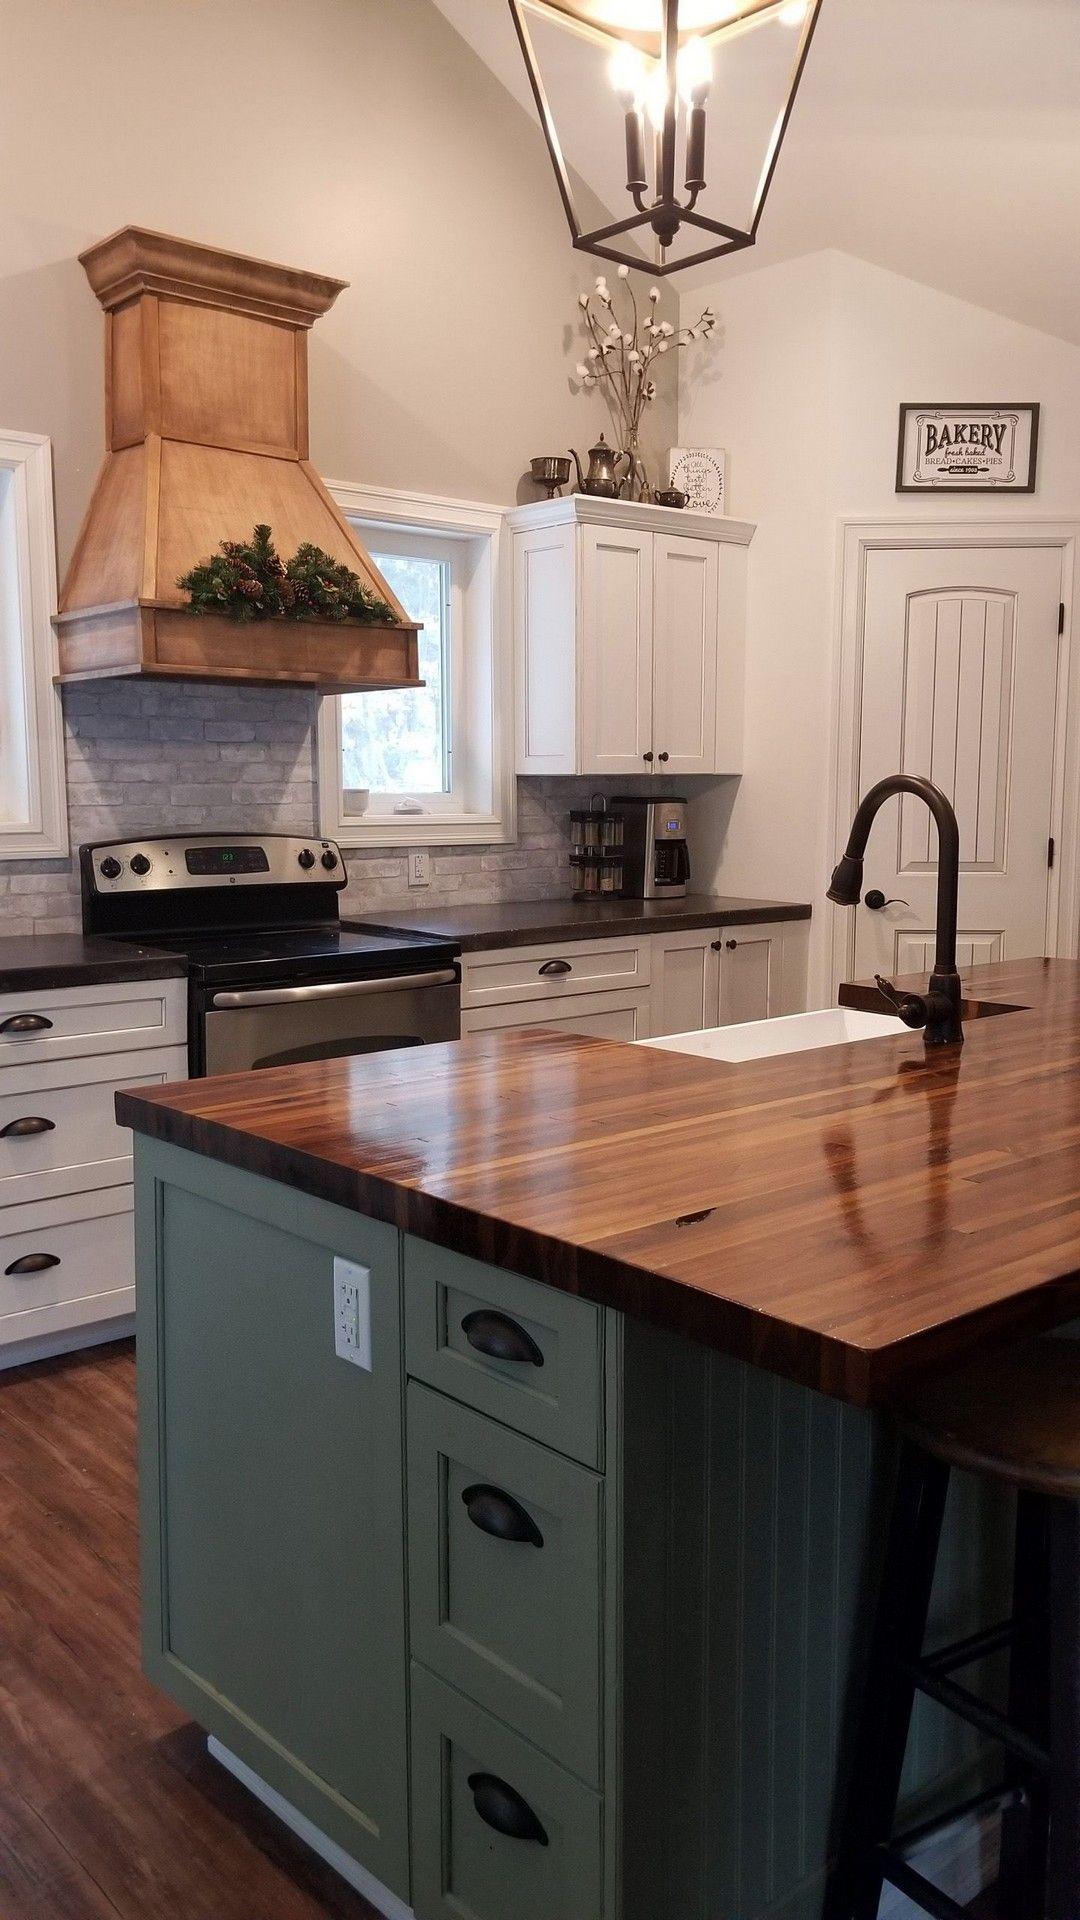 24 inspiration kitchen concrete countertop ideas